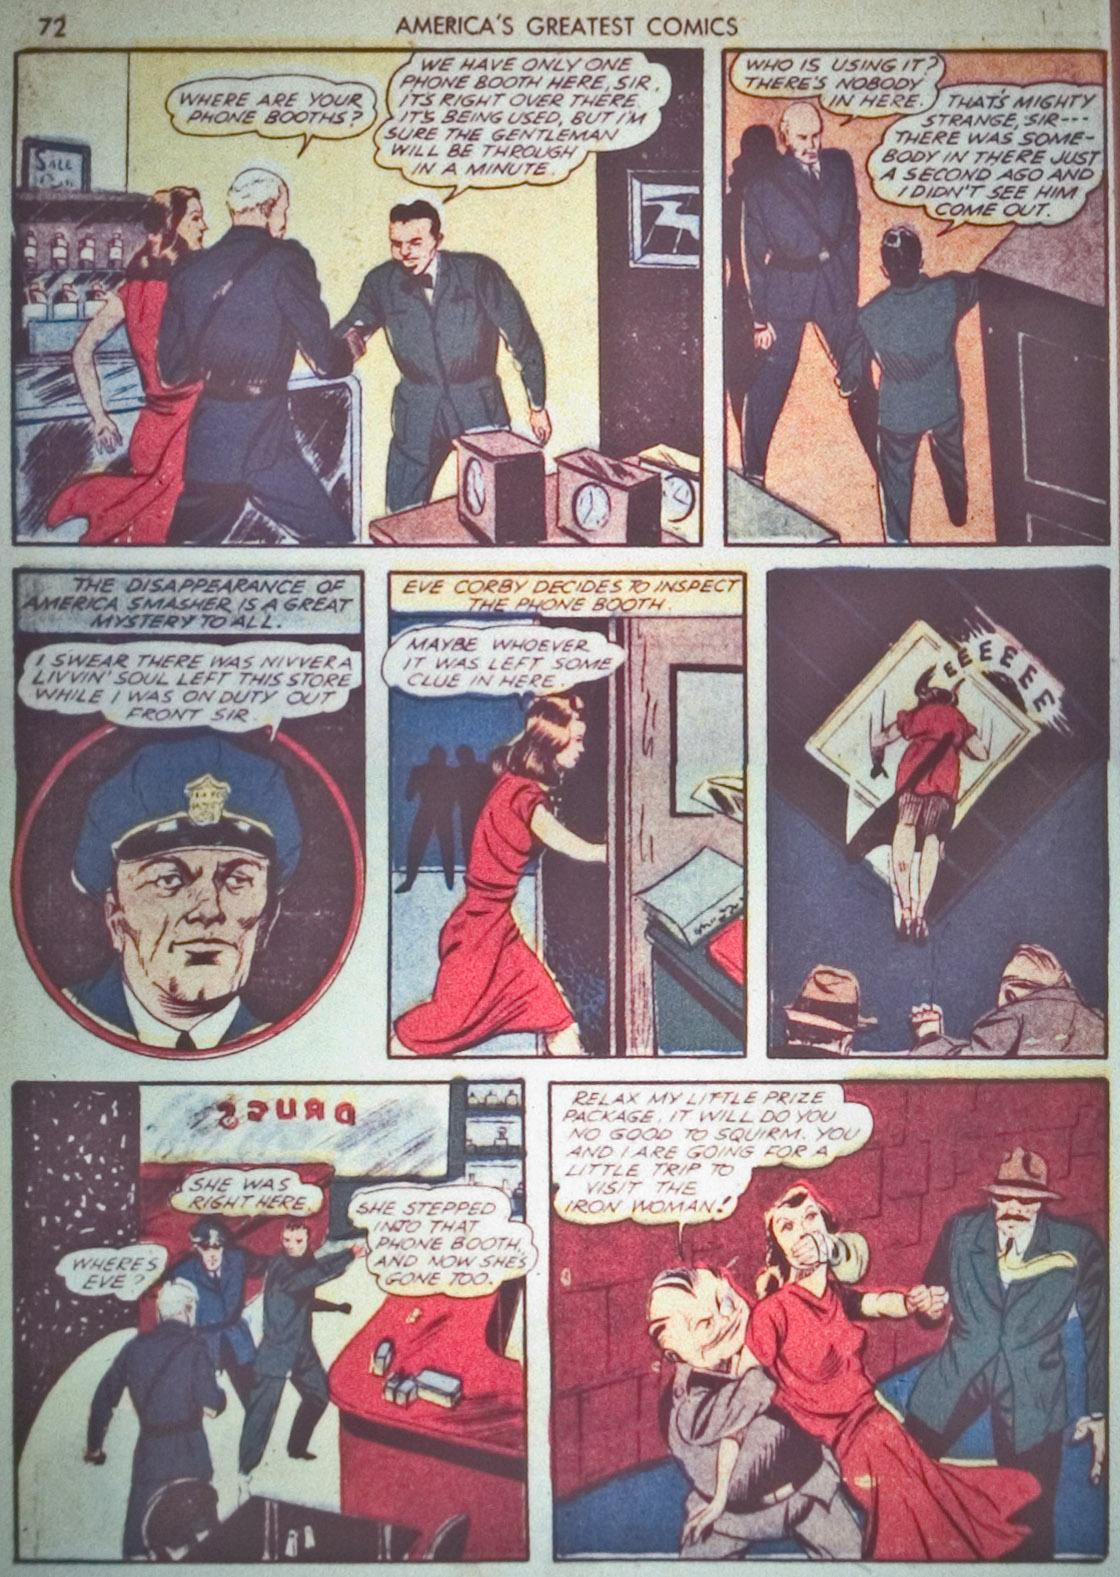 Read online America's Greatest Comics comic -  Issue #1 - 75